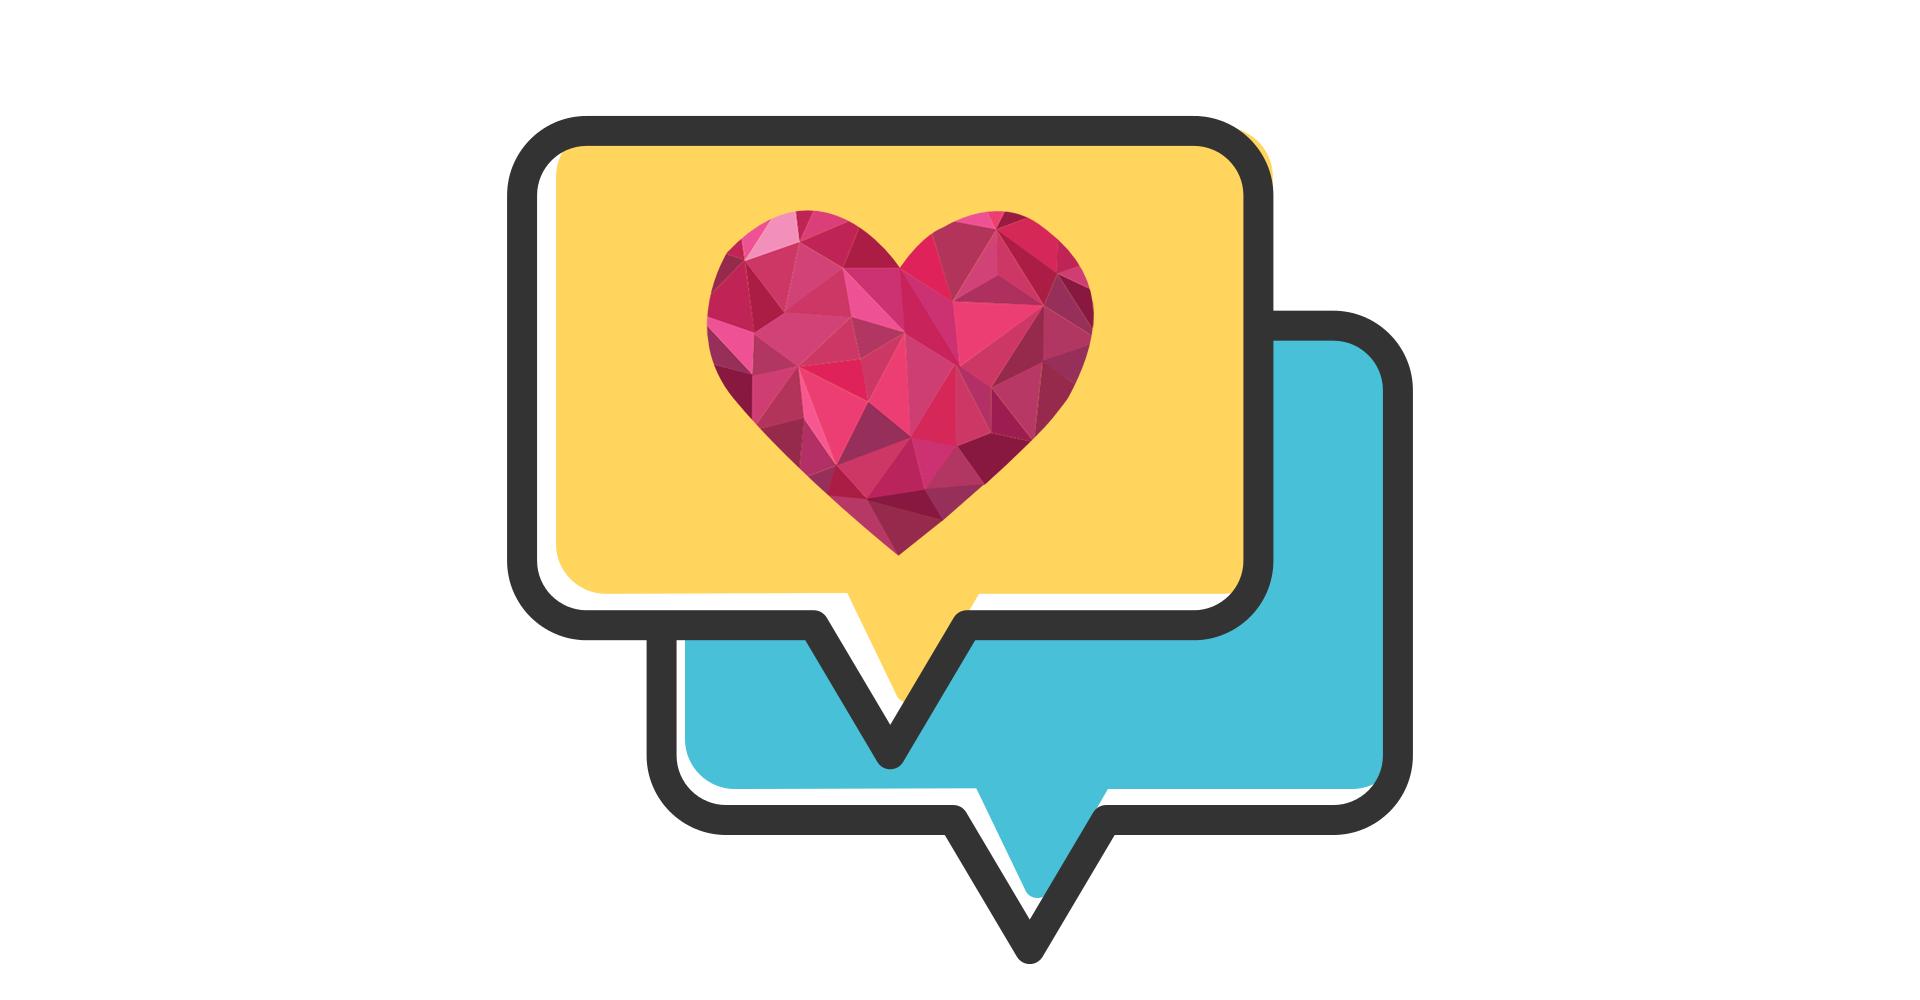 Ich flirte gerne uber Chats! Bin ich da treu?